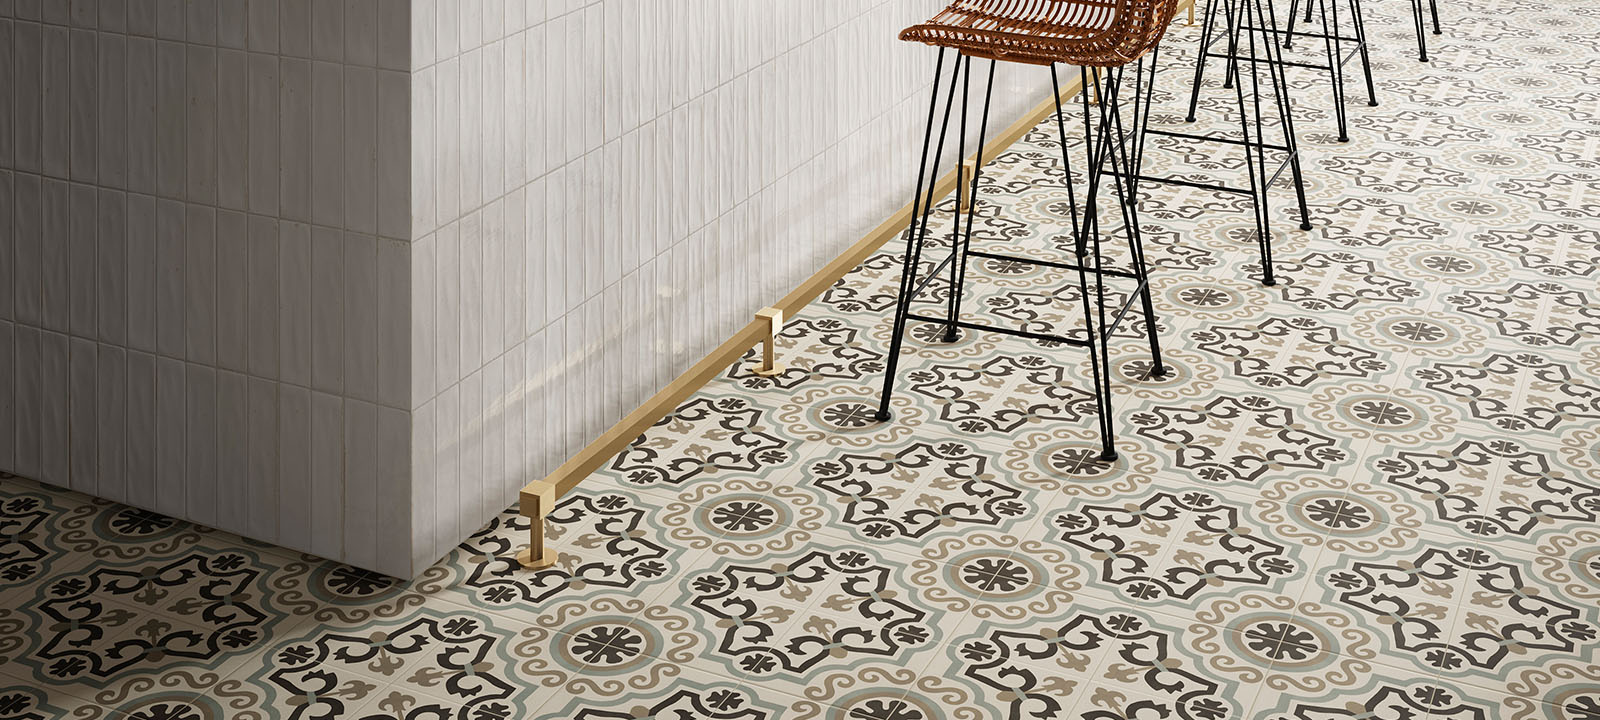 de-segni-blend porcelain tiles